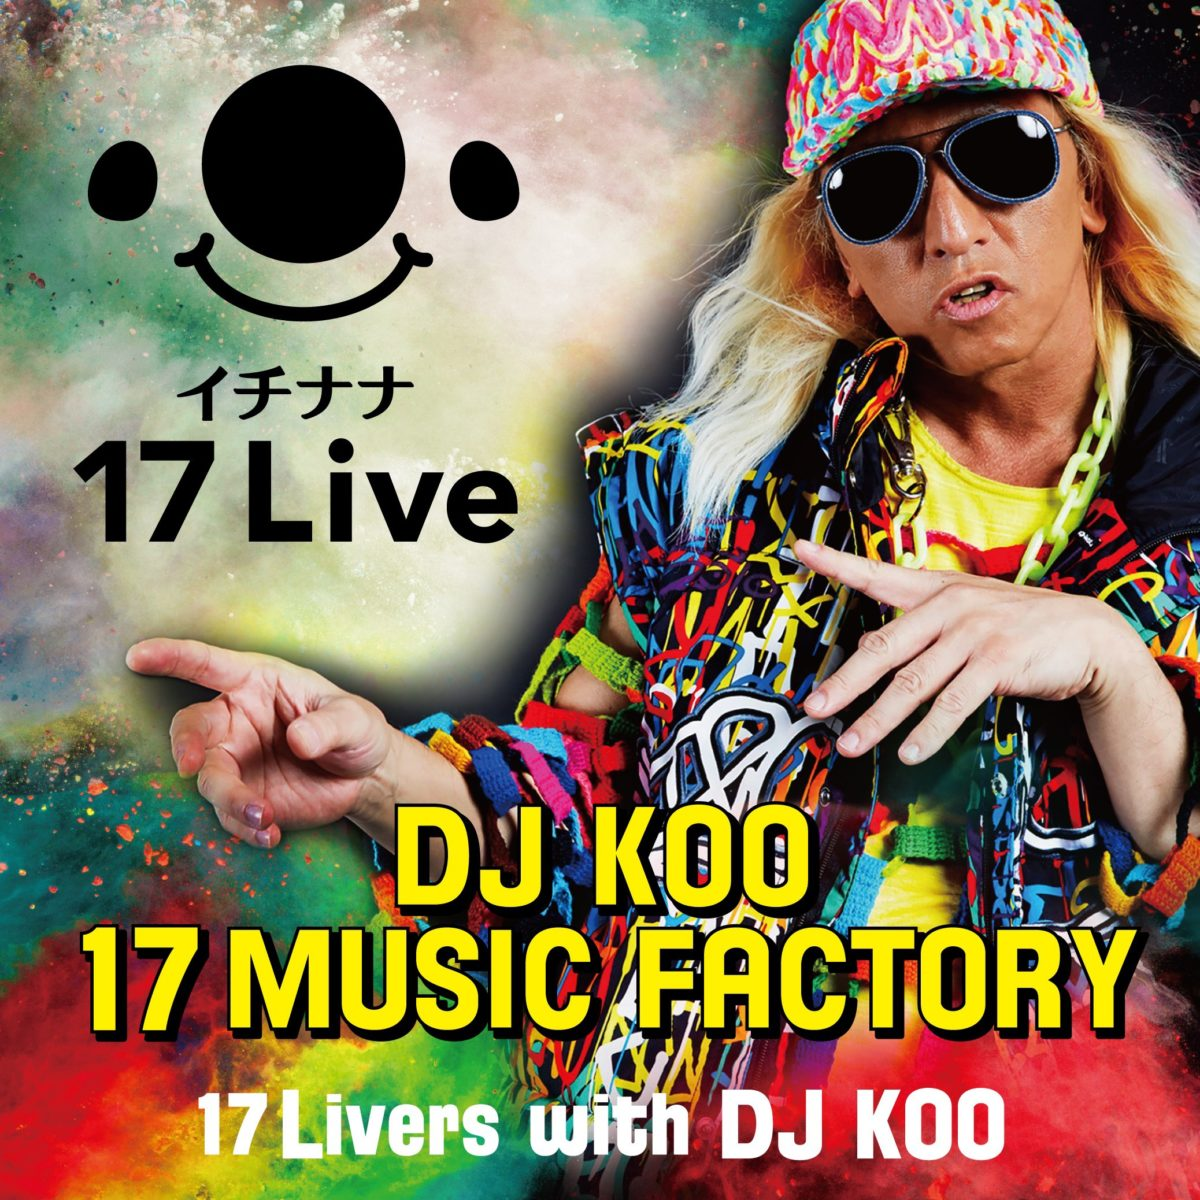 『DJ KOO 17 MUSIC FACTORY』iTunes J-POPカテゴリ3位獲得🎉